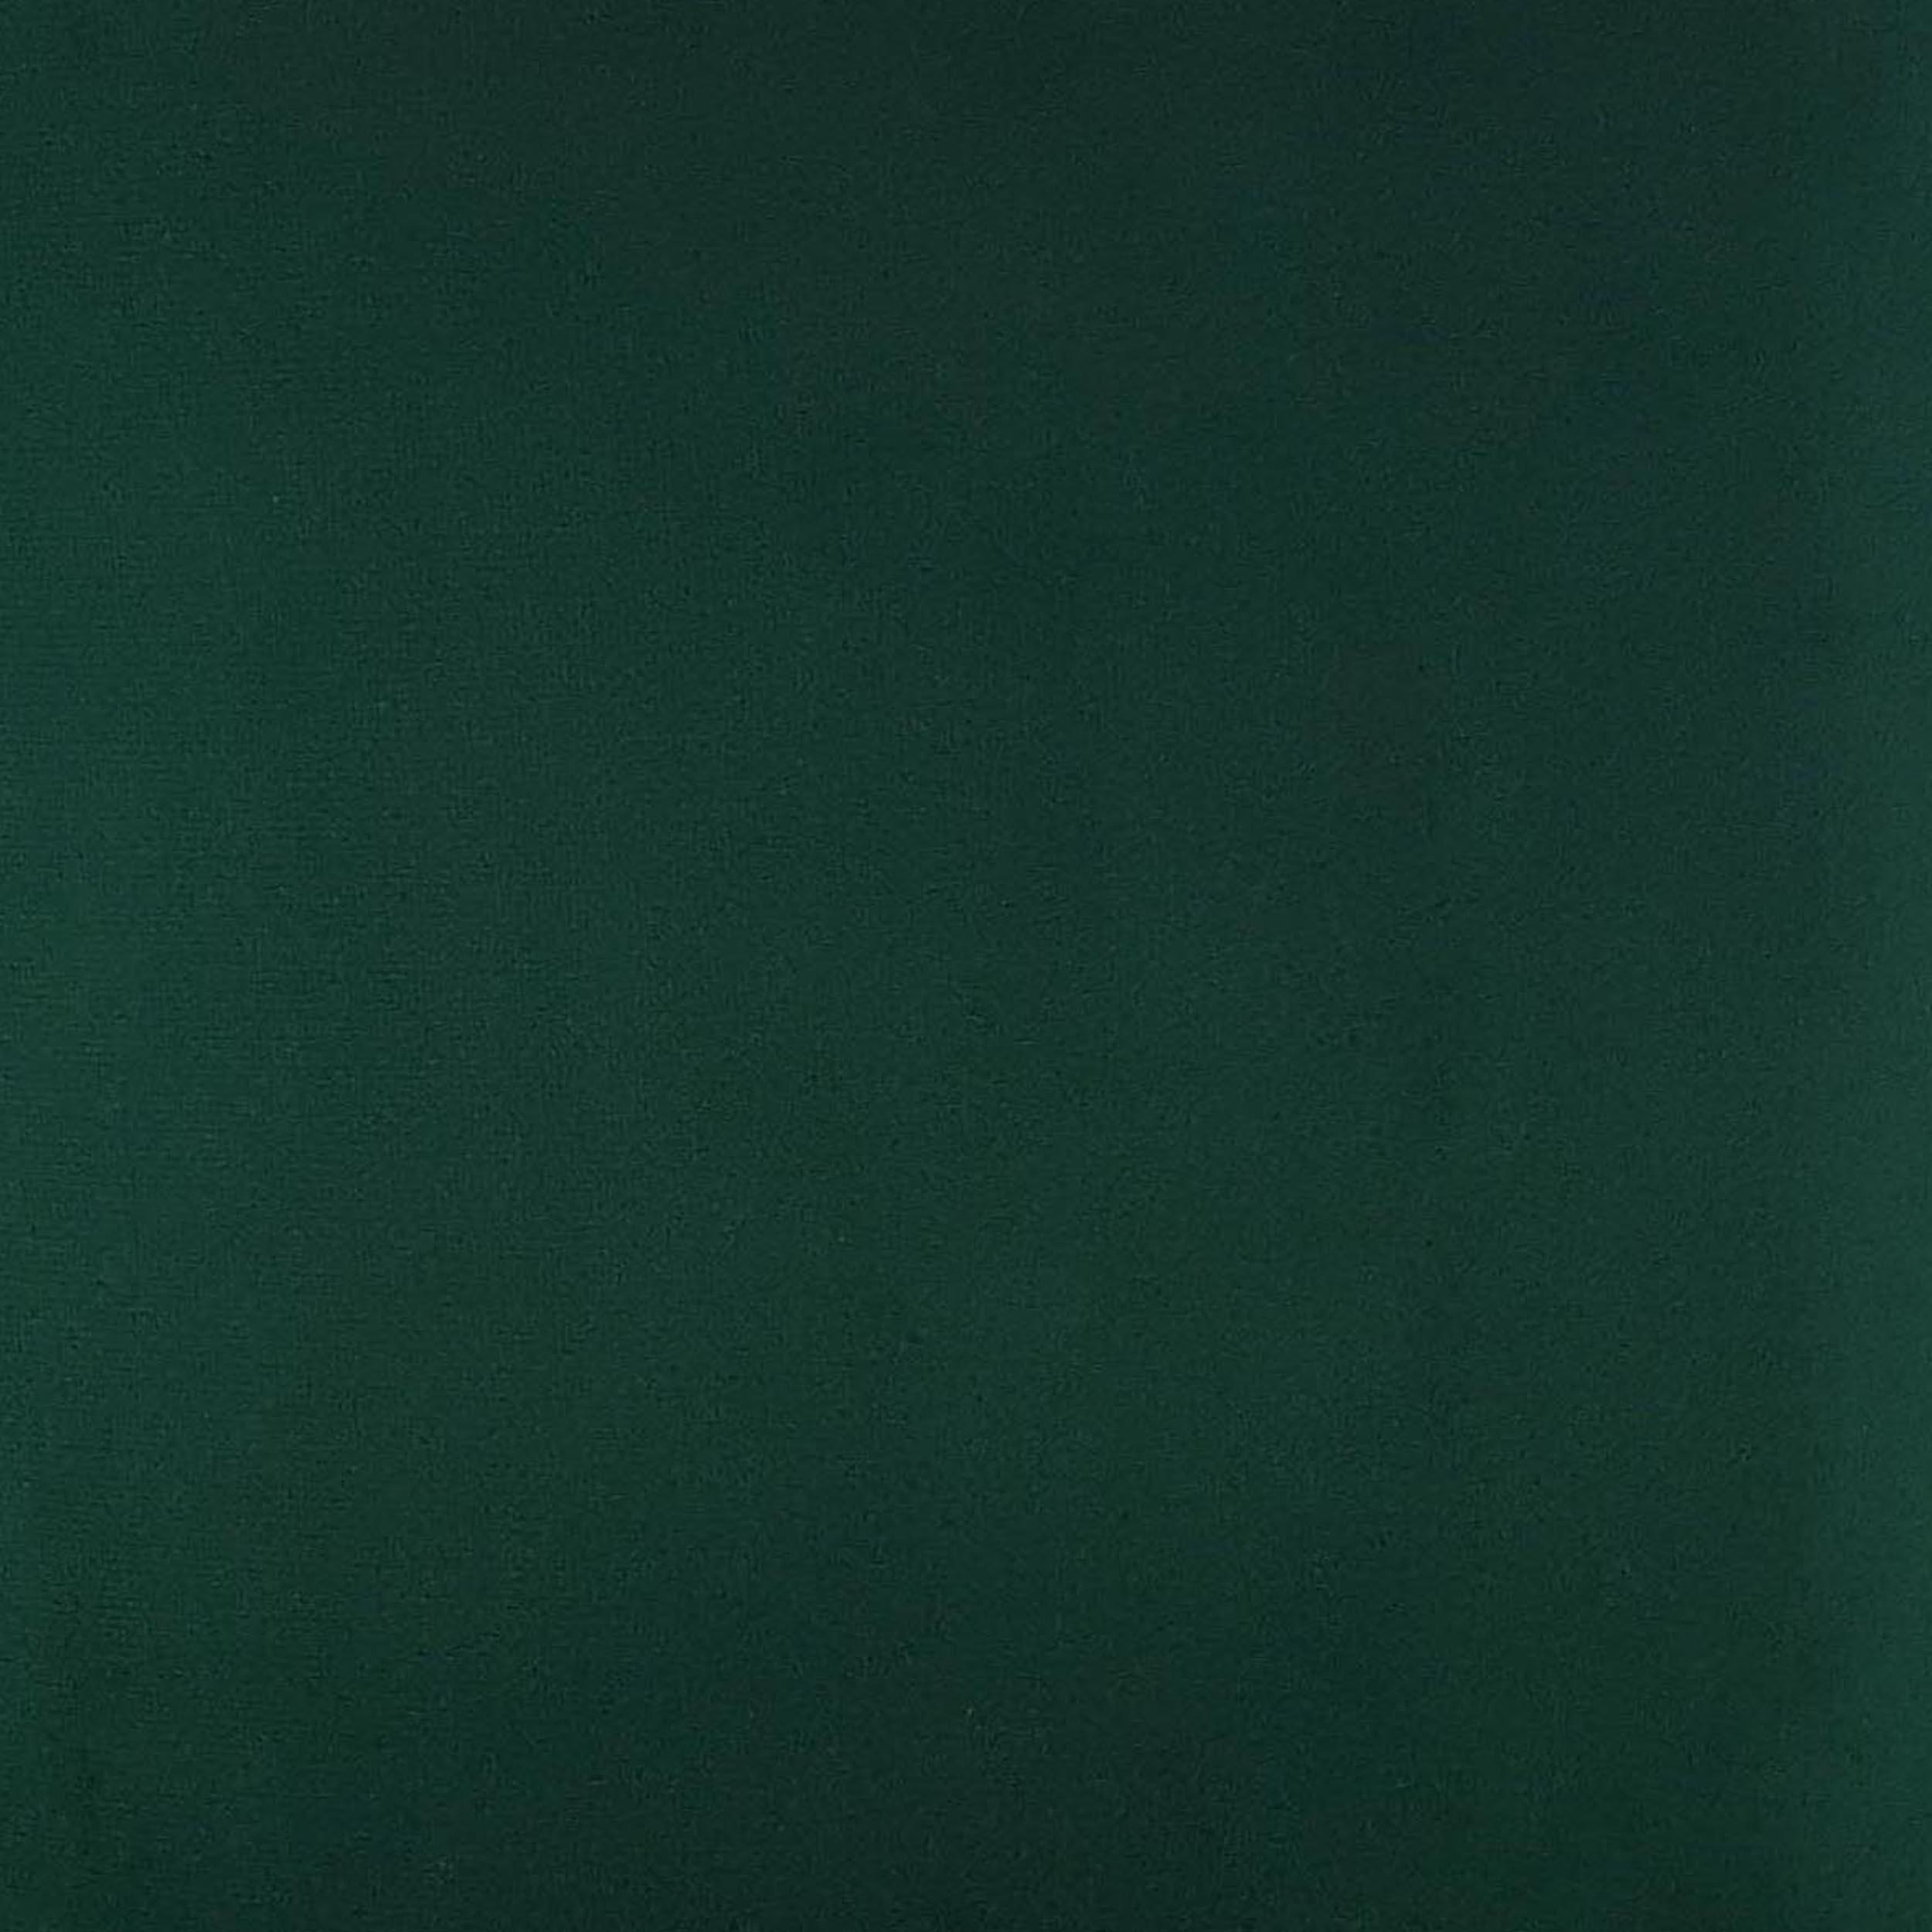 Dark Green Velvet to Purchase By the Metre